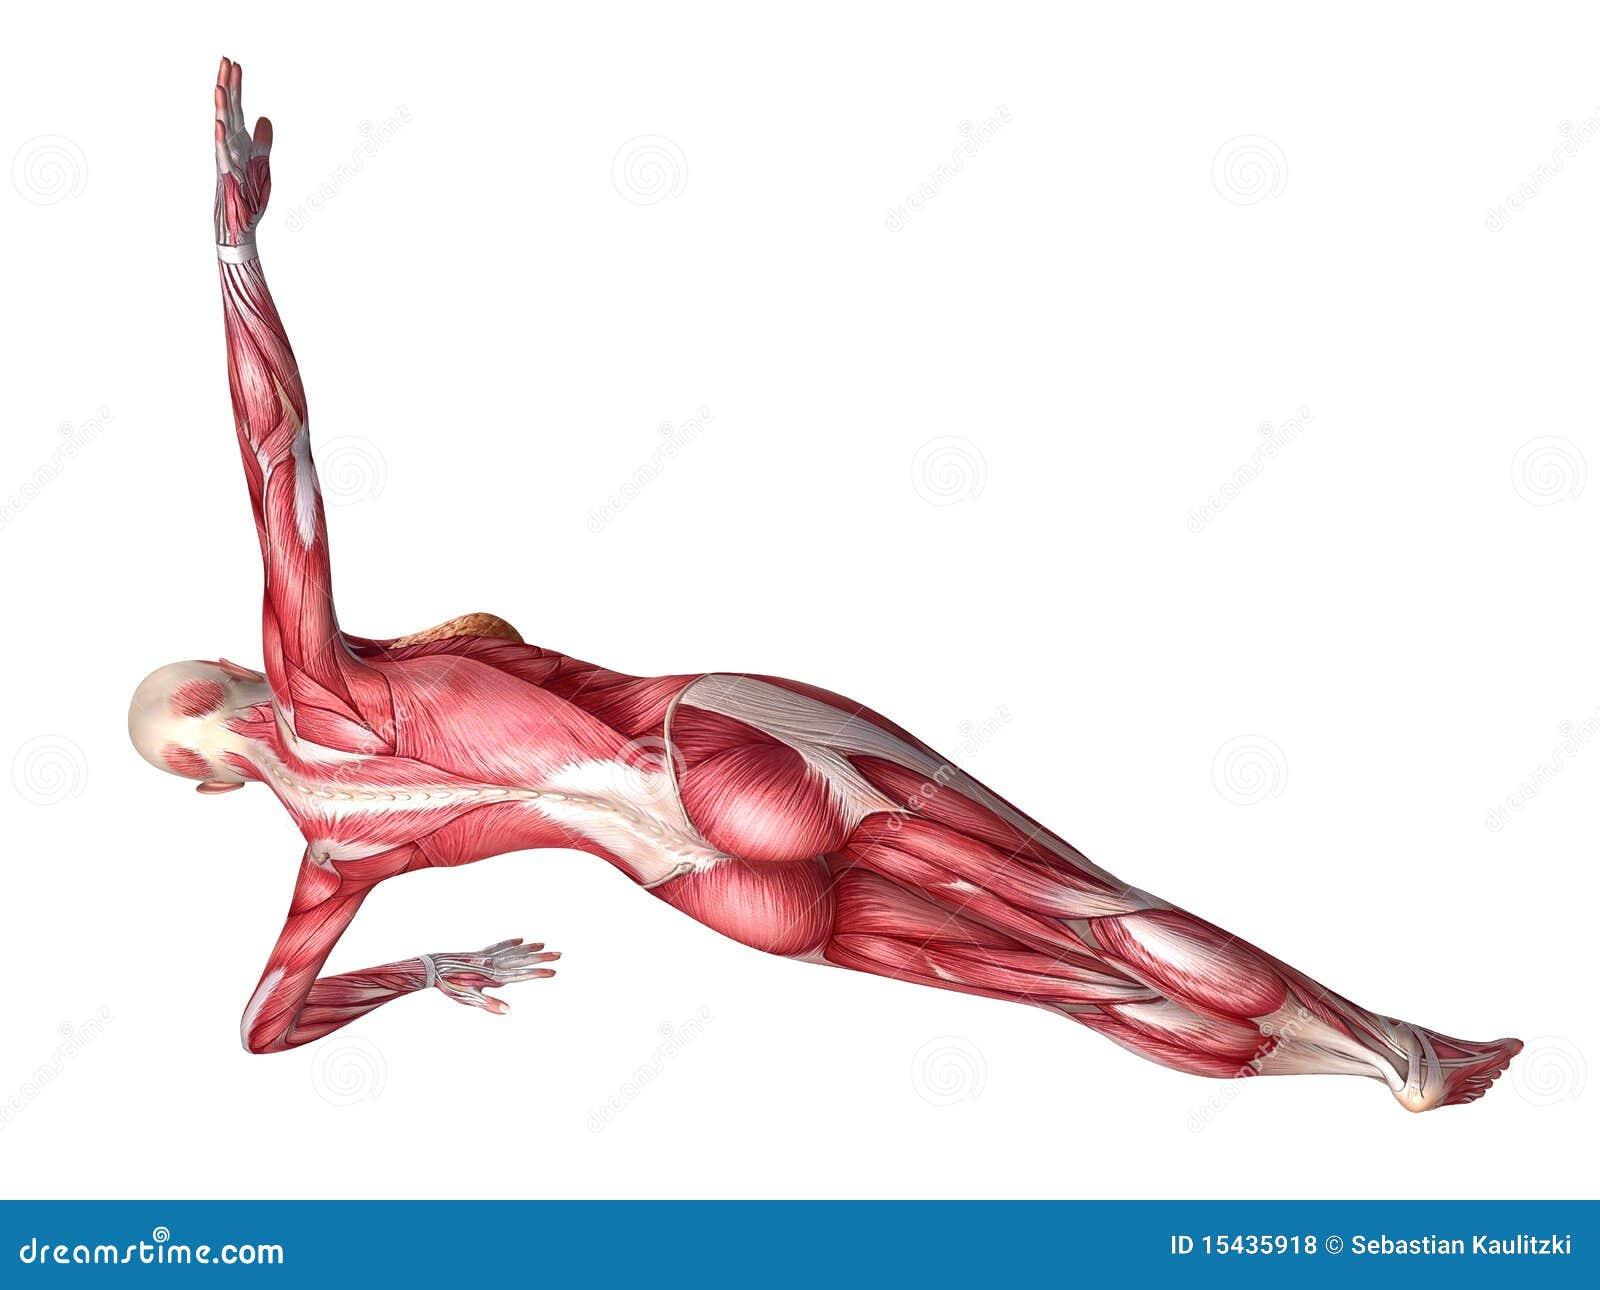 Female abs workout stock illustration. Illustration of diagram ...